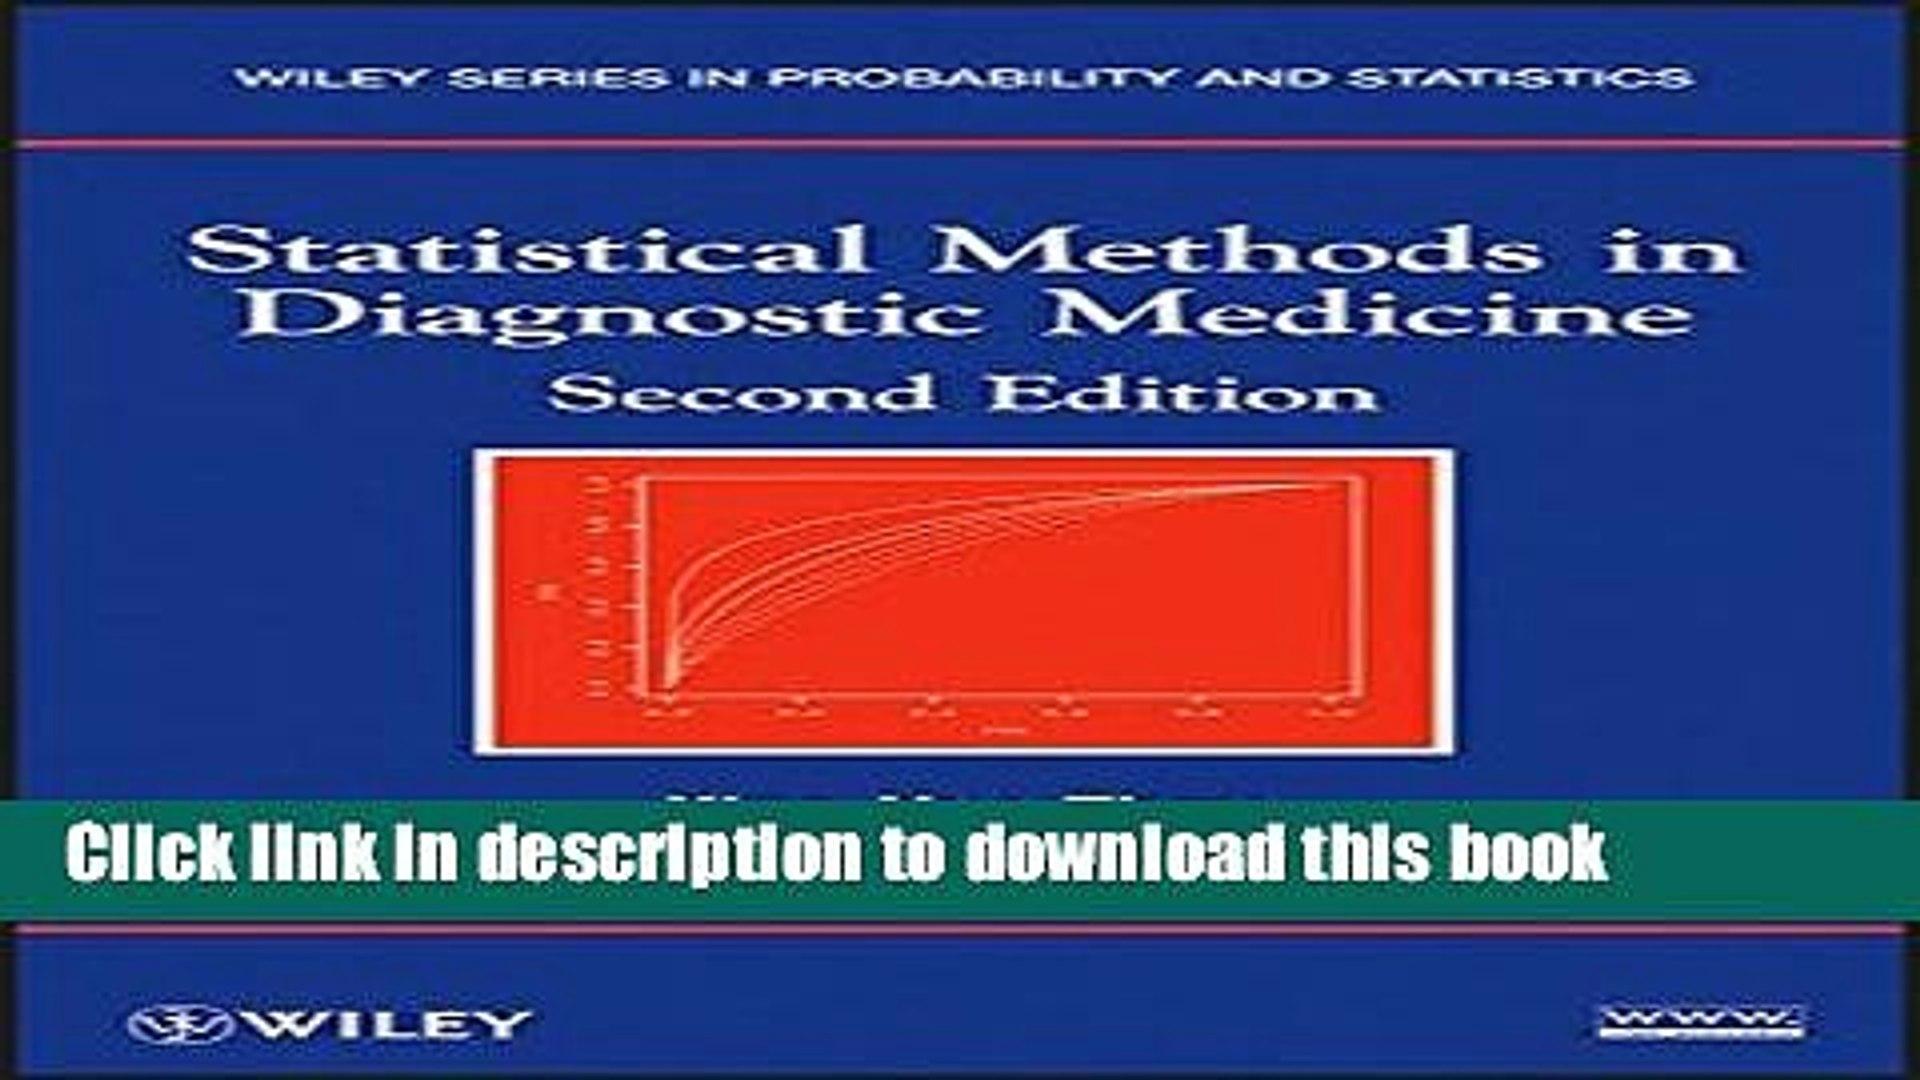 Statistical Methods in Diagnostic Medicine, Second Edition